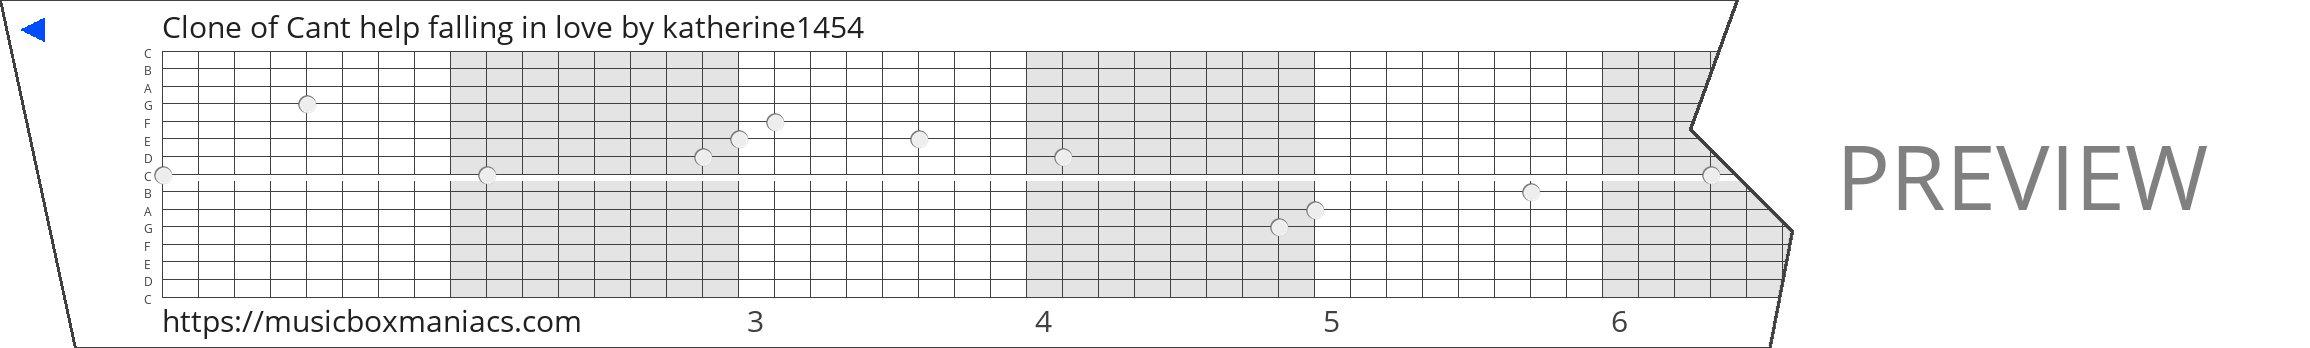 Clone of Cant help falling in love 15 note music box paper strip